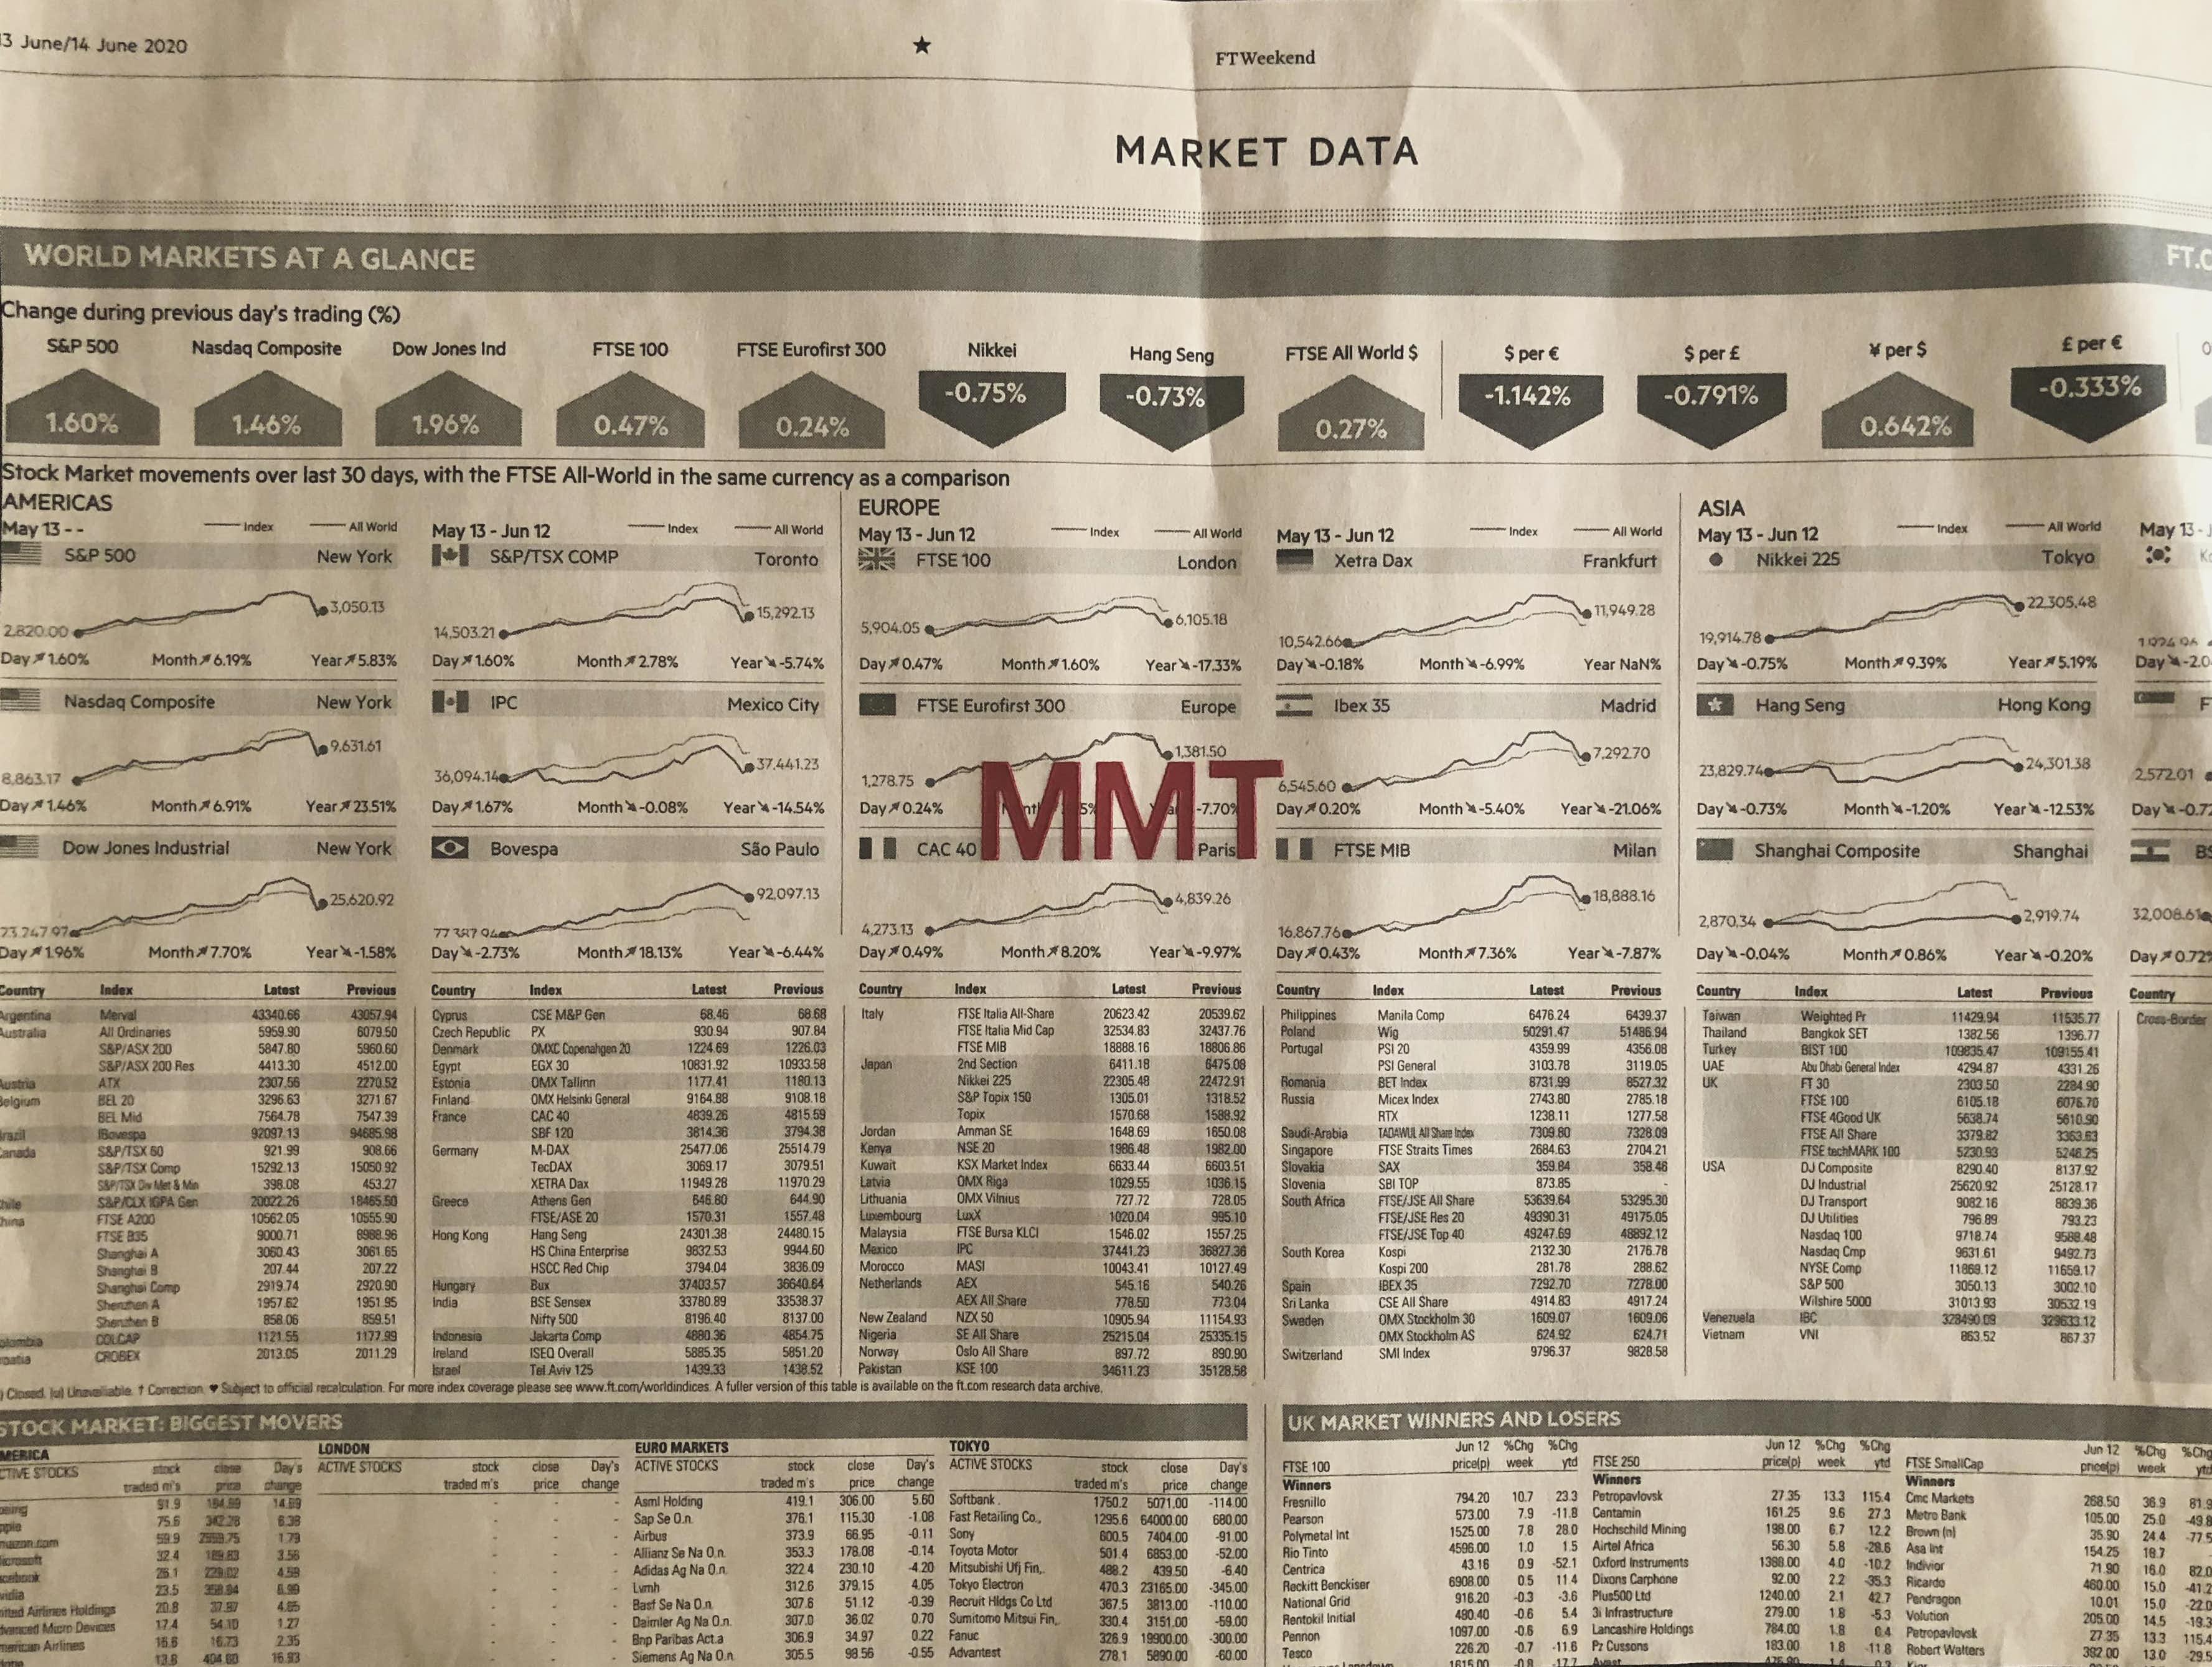 Modern Monetary Theory, 2020. Acrylic lettering on newspaper, 21 x 28 cm